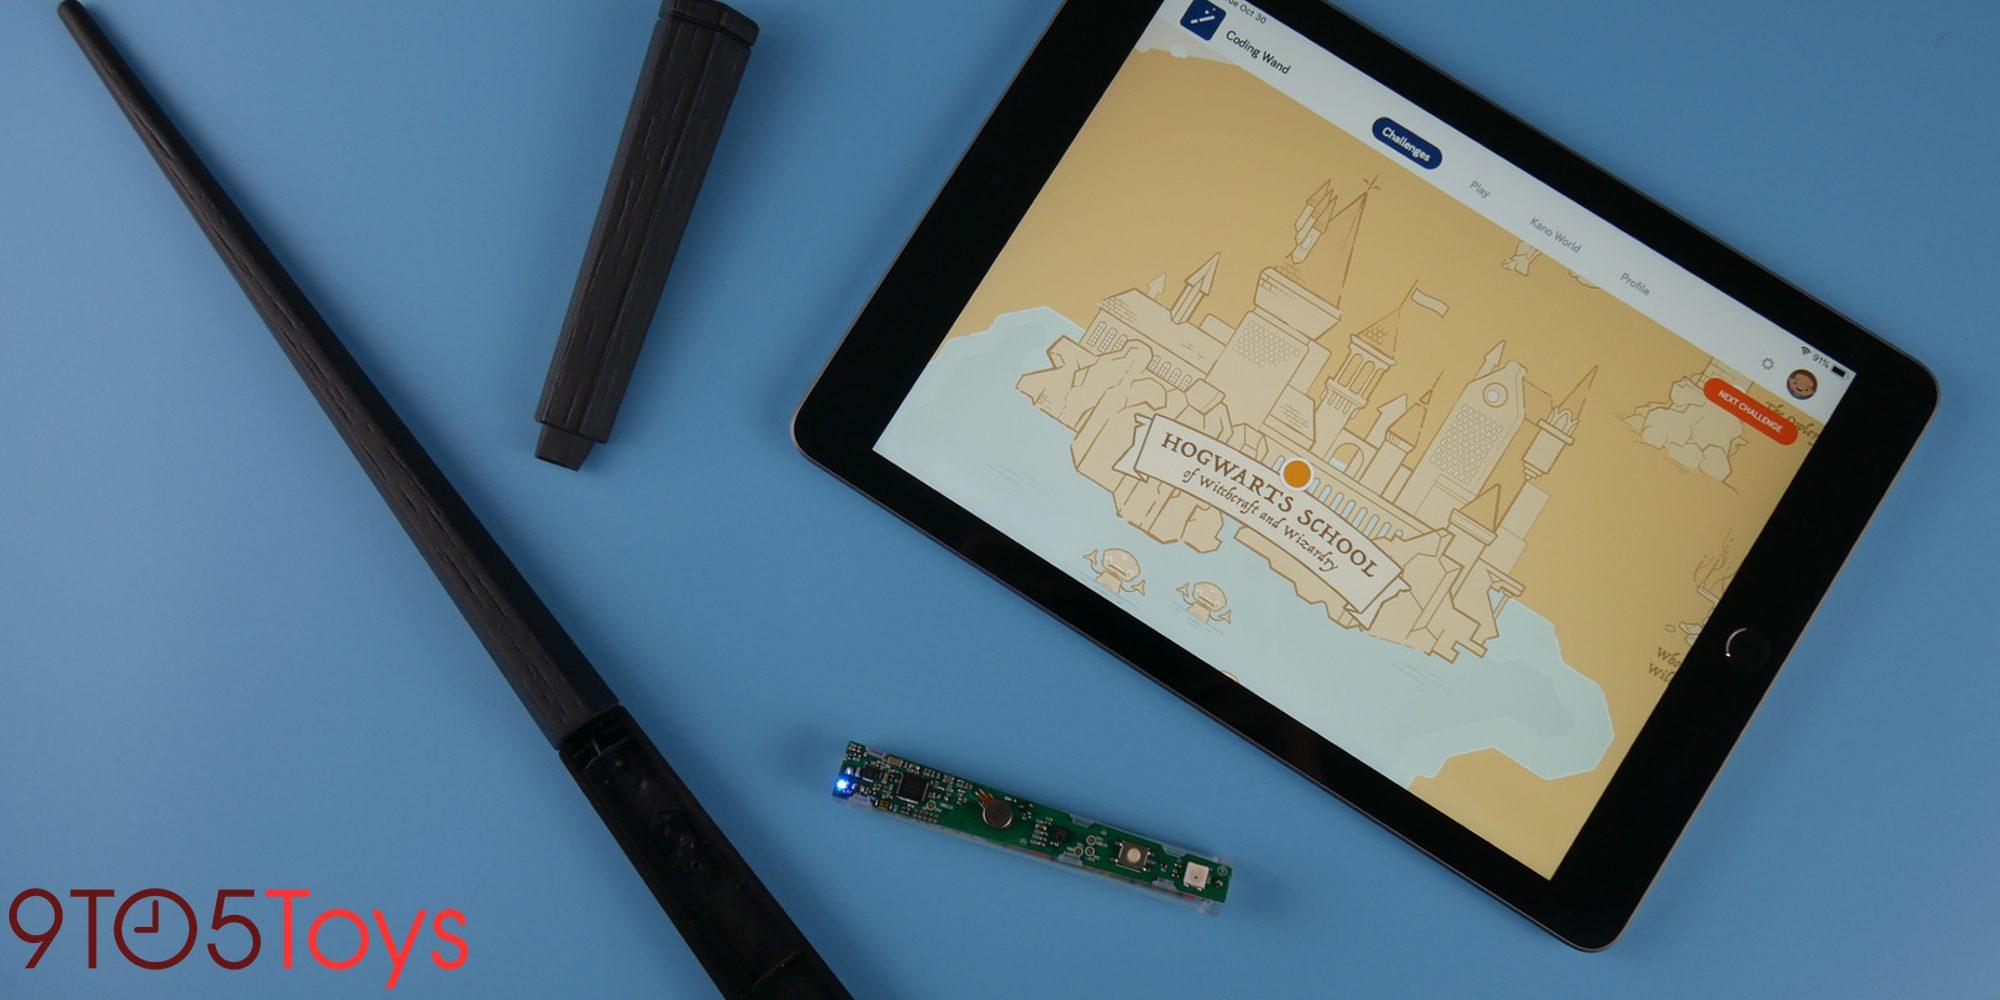 9to5Toys Letzter Anruf: Chromecast $ 26, Nest Protect Rauchmelder $ 95, Aukey 6-Fuß-USB-C-Kabel $ 7, mehr